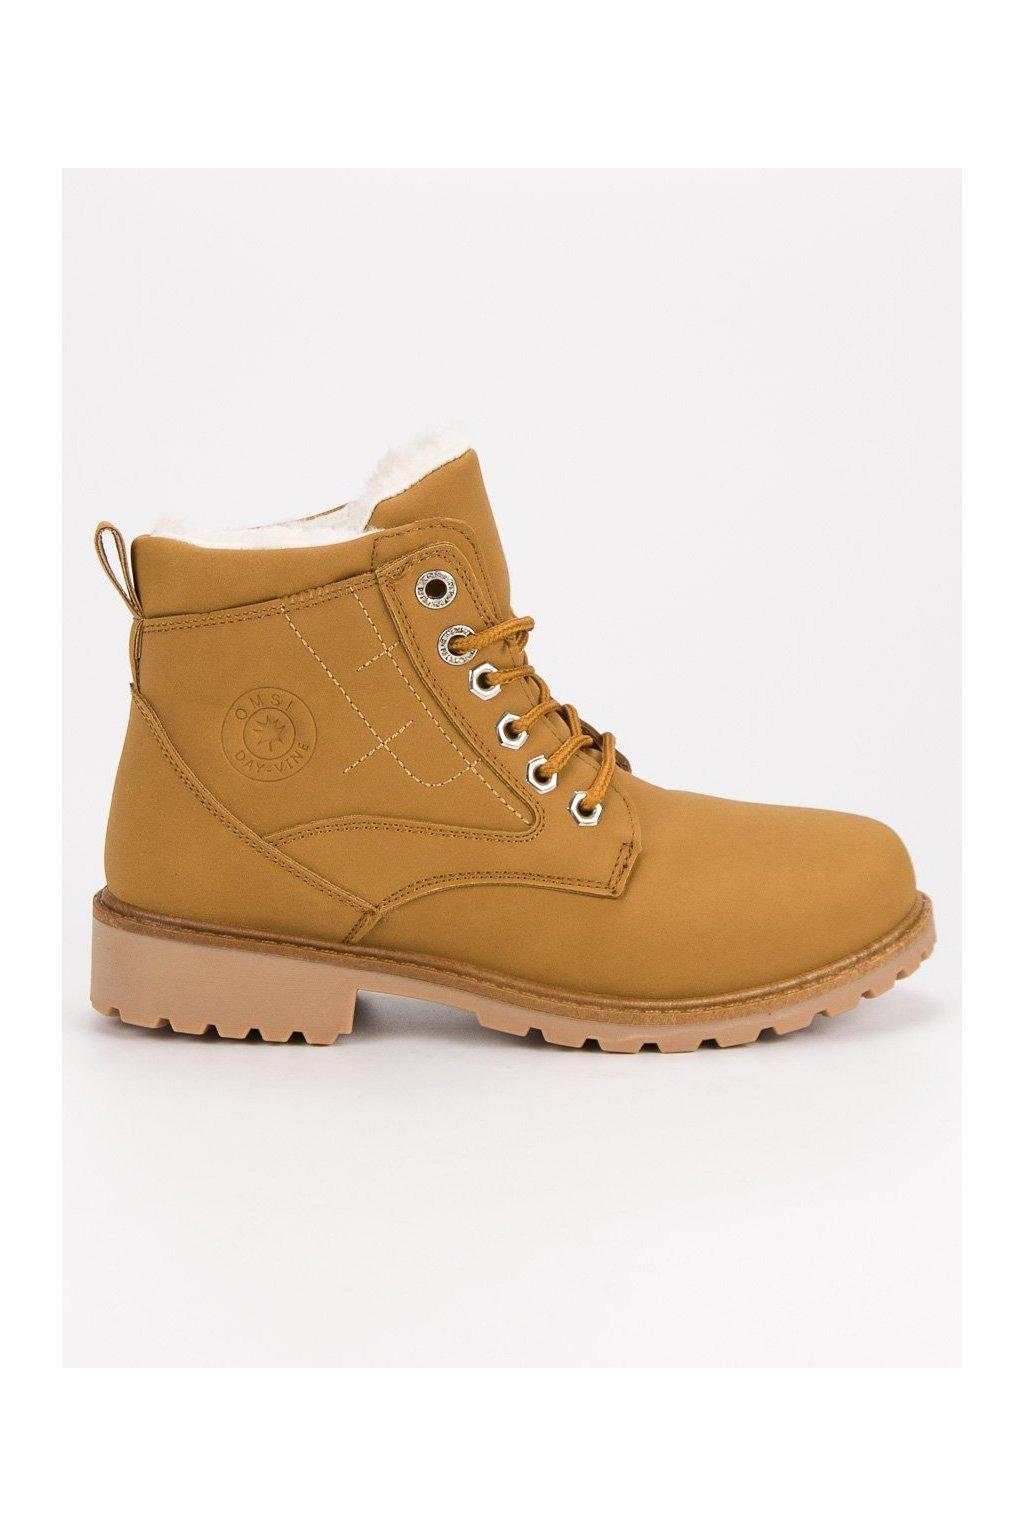 fb1dcba417 Zimna obuv humanic